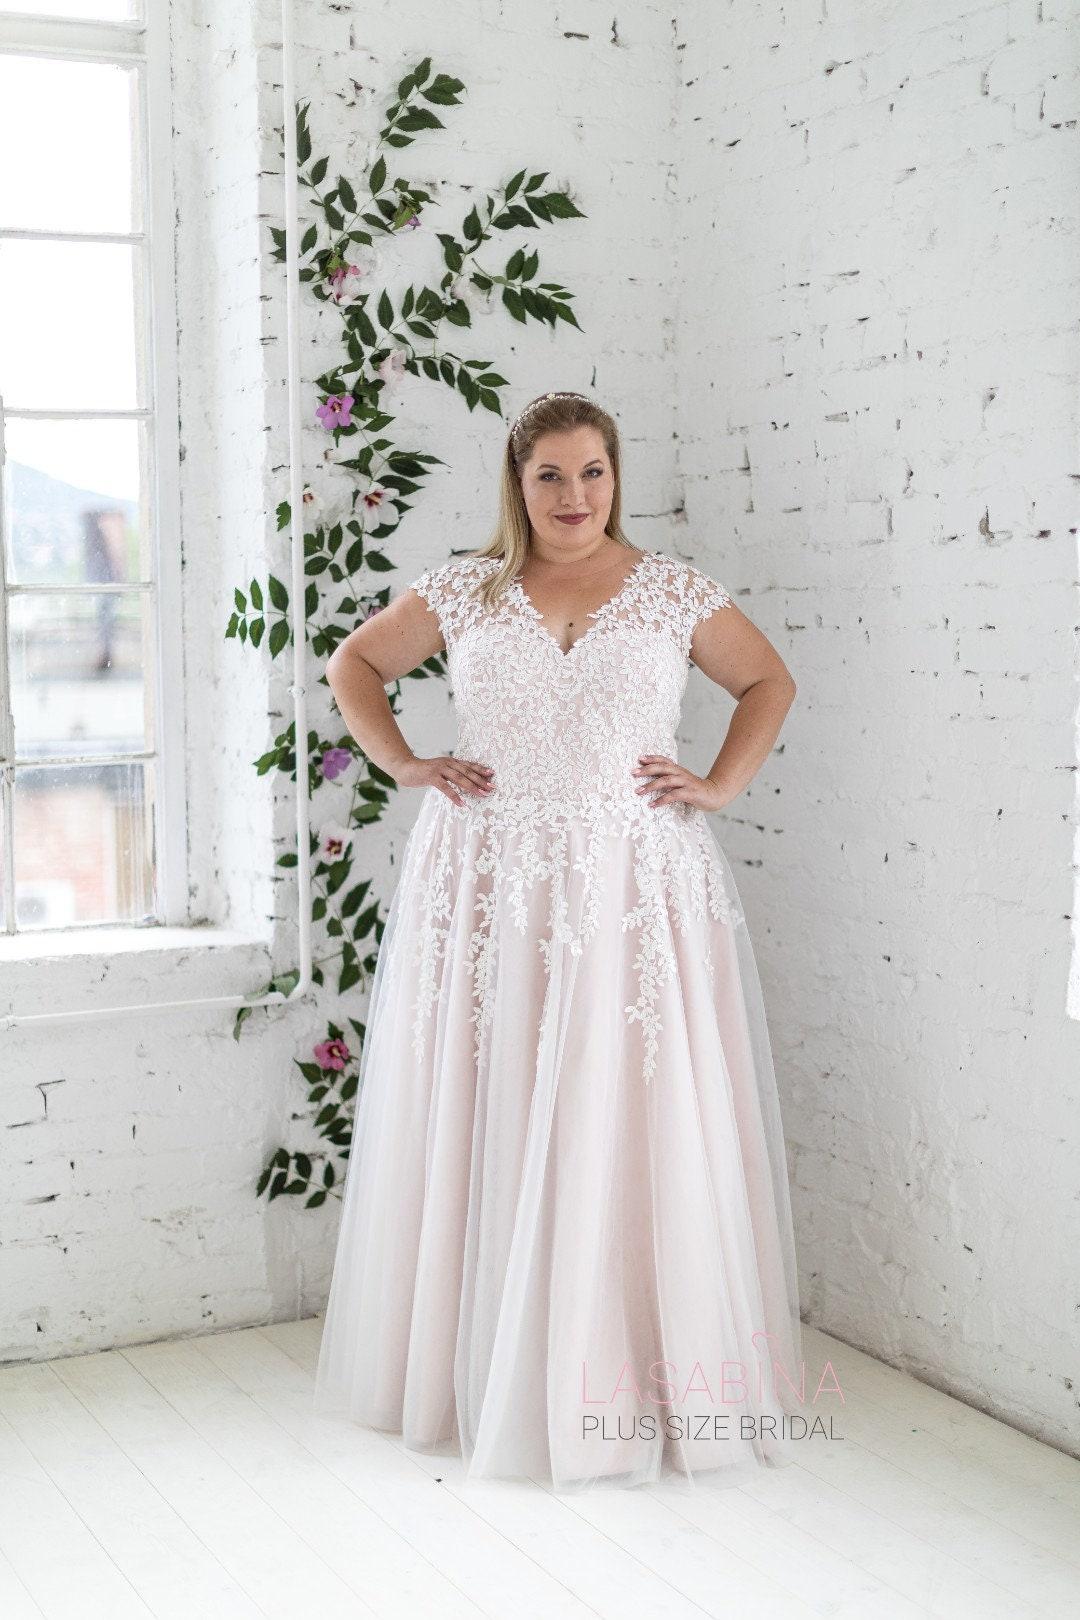 Plus size wedding dress, pluss size wedding dress with sleeves, cap sleeves  plus size wedding dress